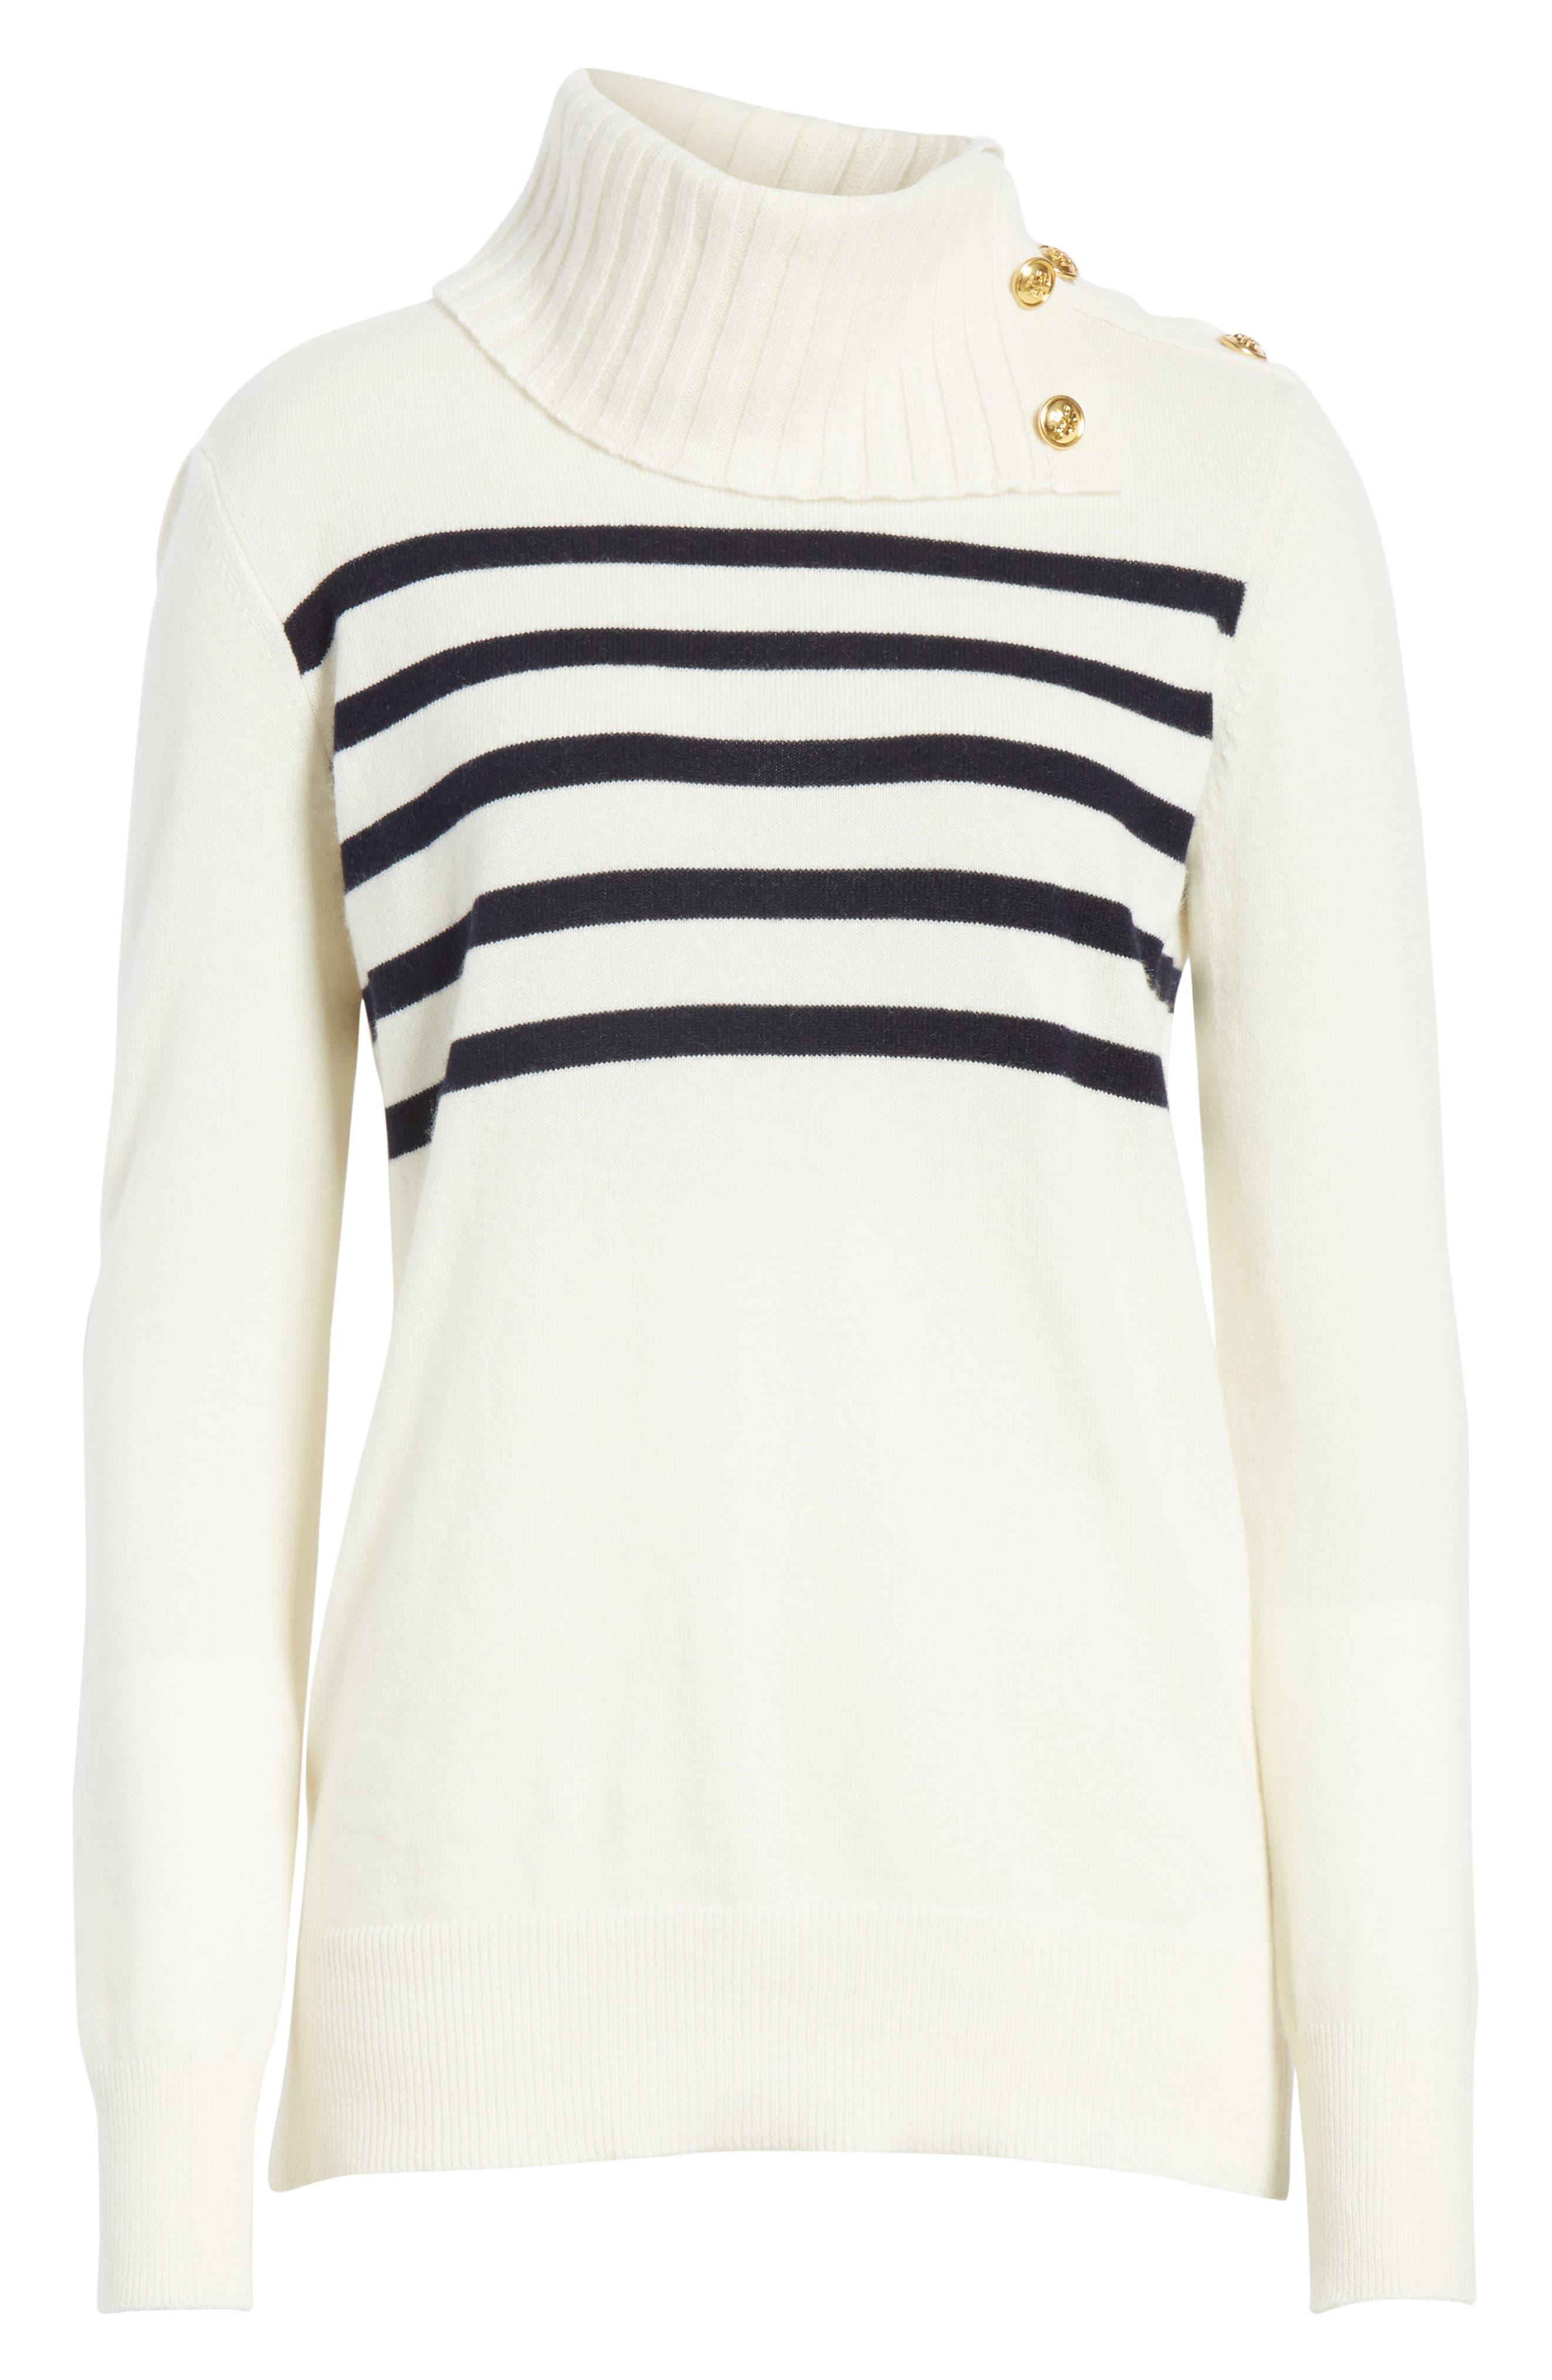 Sandra Cashmere Sweater,                             Alternate thumbnail 6, color,                             128